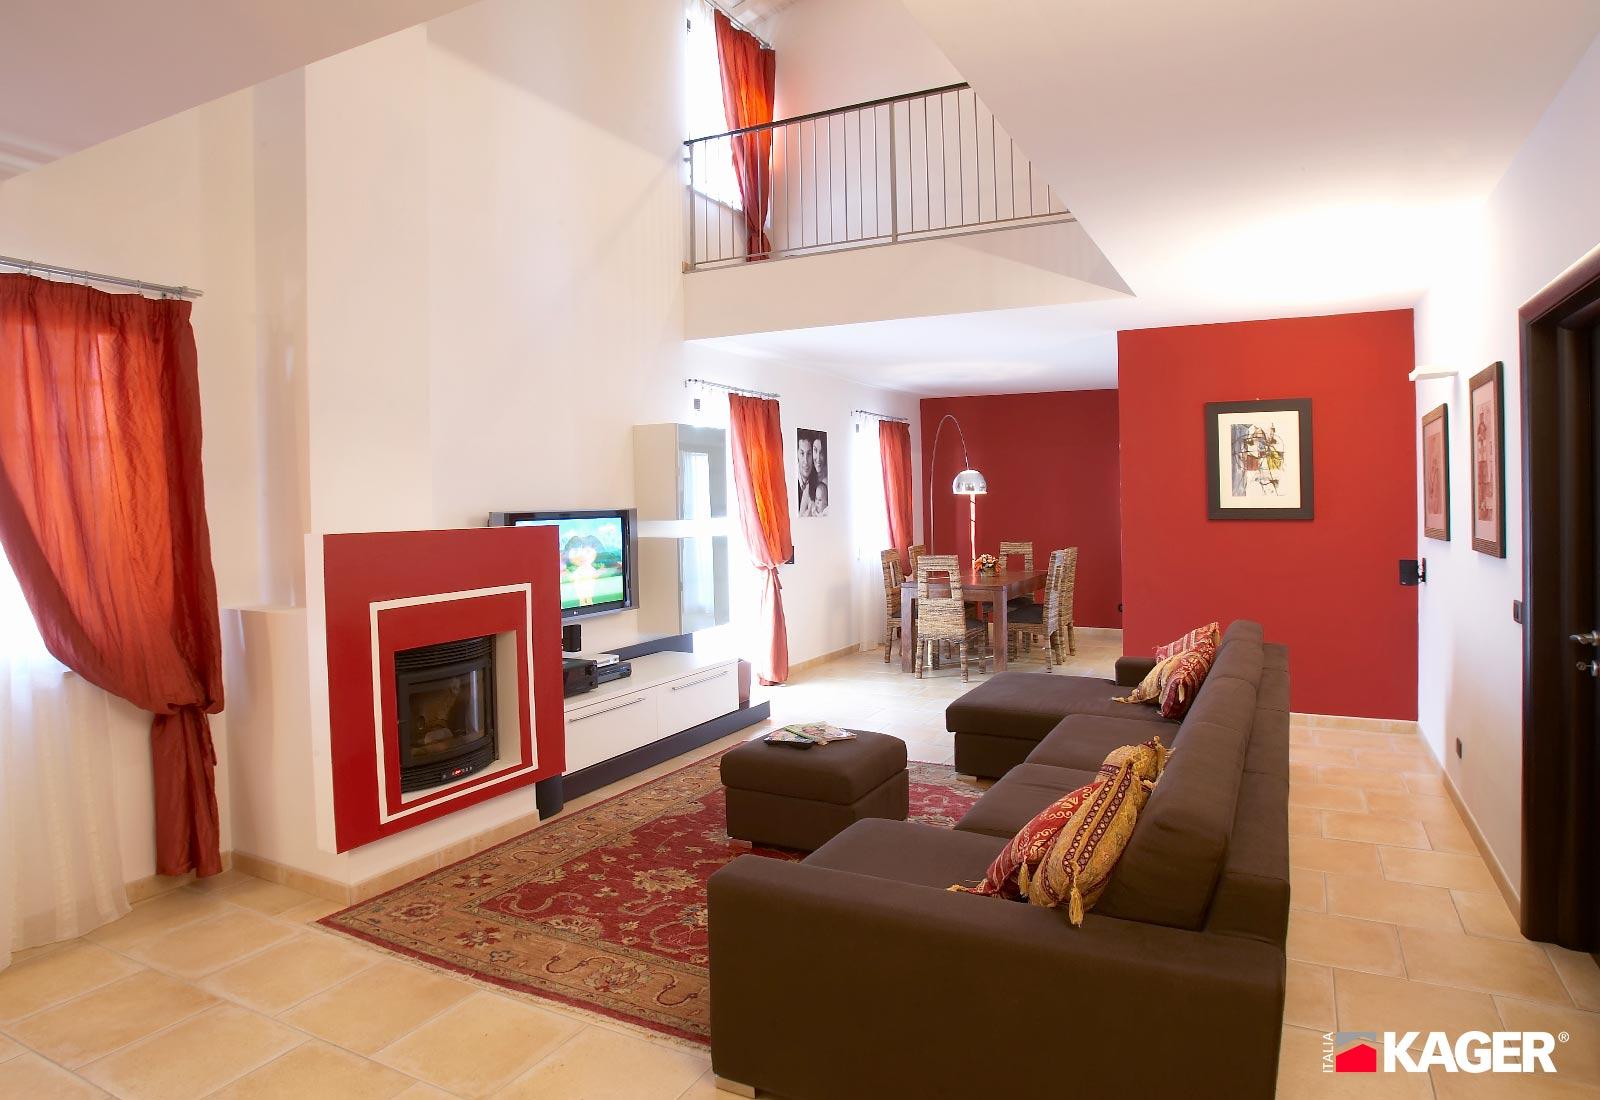 Casa-in-legno-Ferrara-Kager-Italia-10